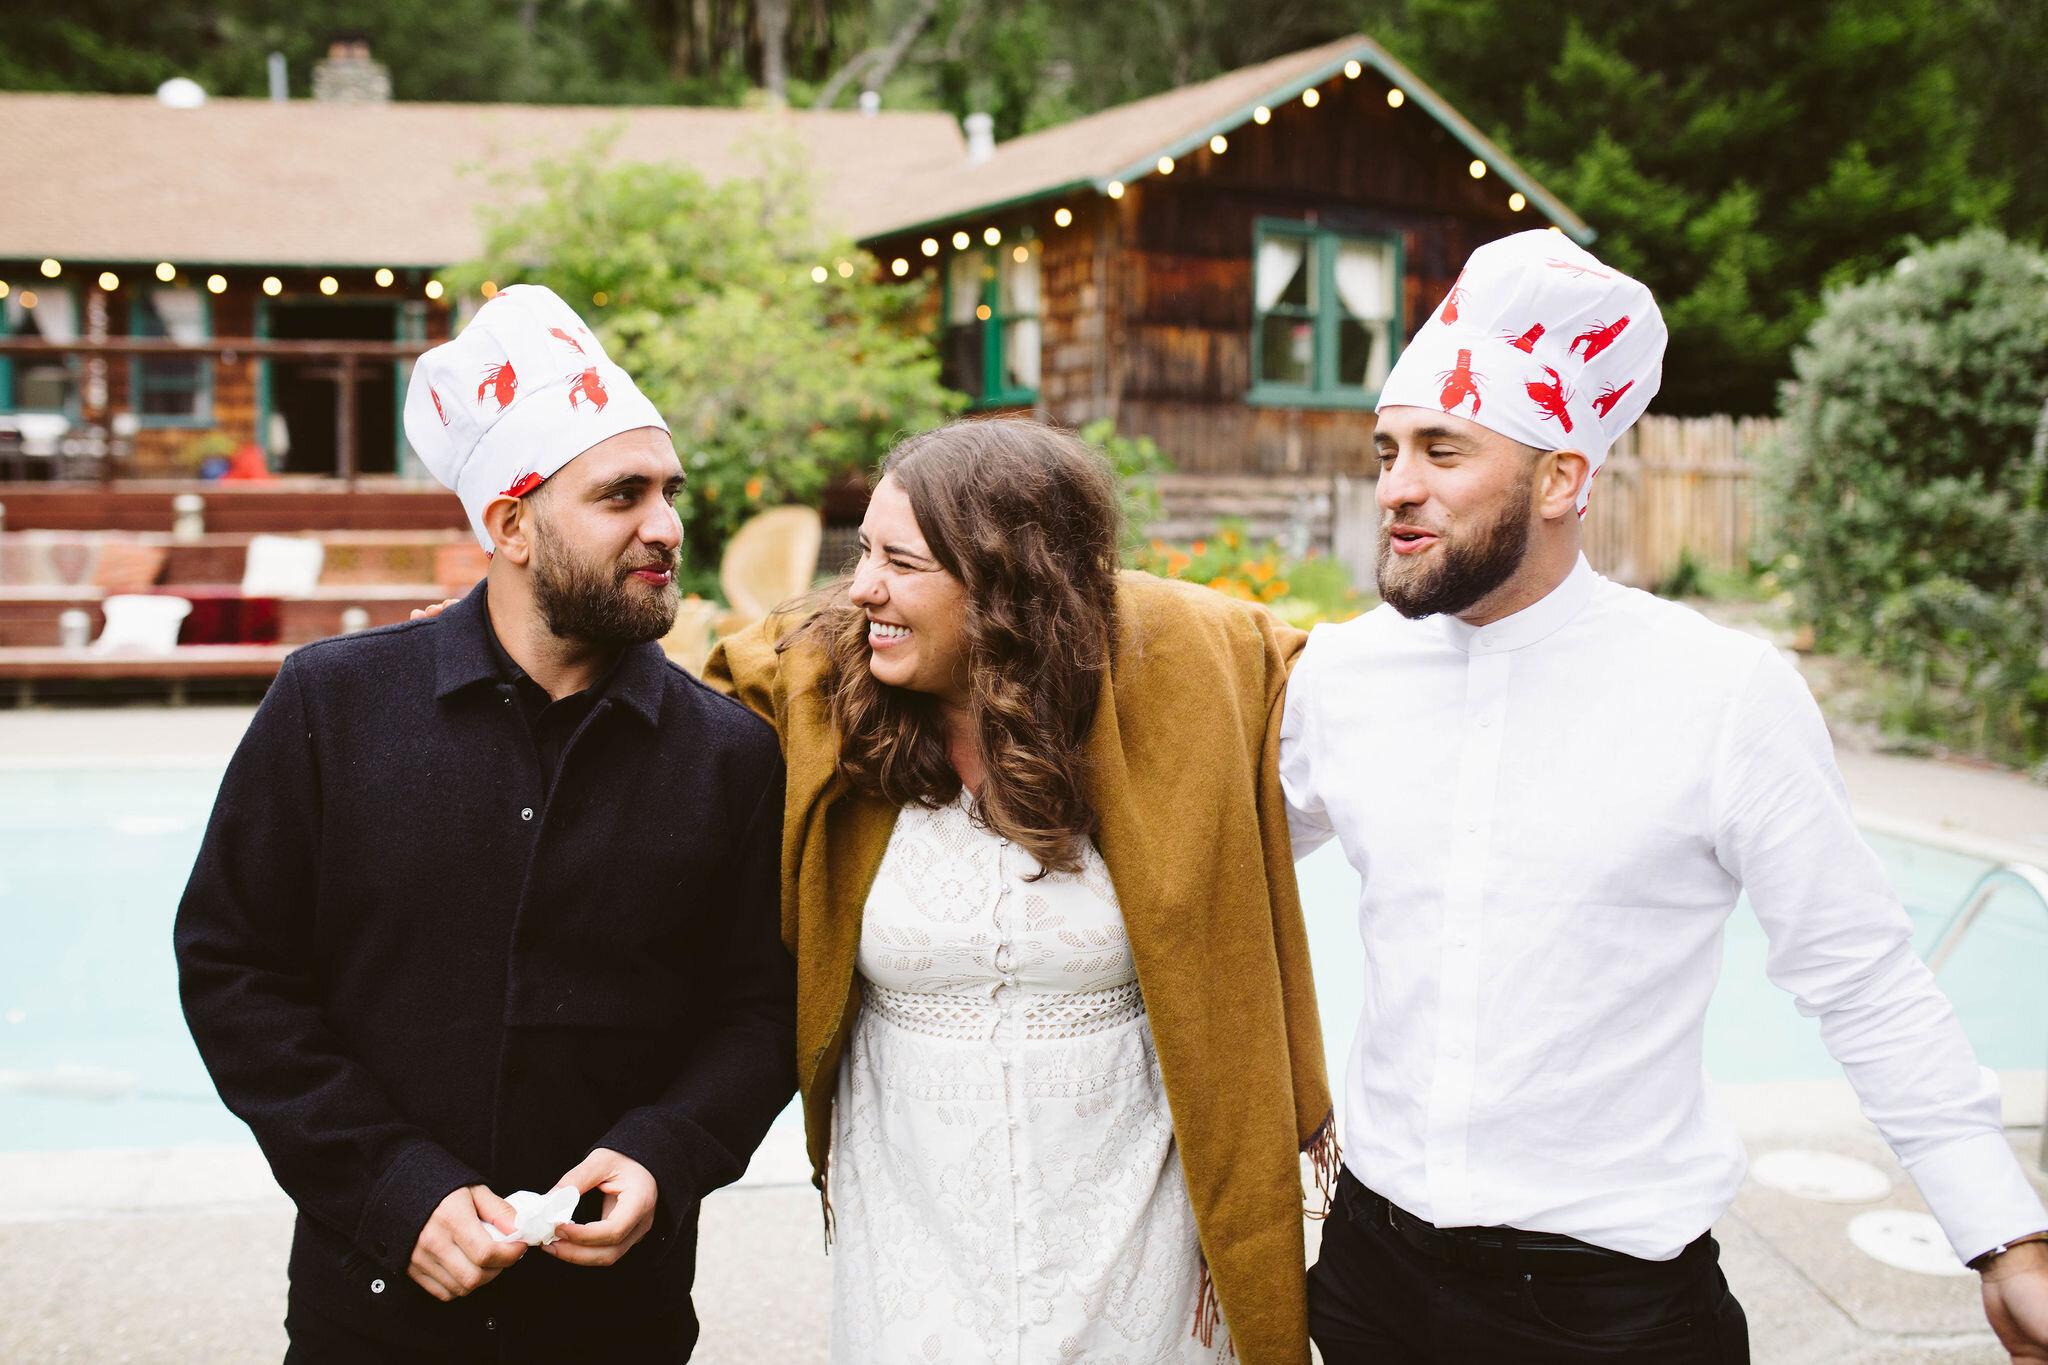 Venture-Retreat-Center-Wedding-Pescadero-Fri-Aaron-Pritam-The-Shalom-Imaginative-84.jpg